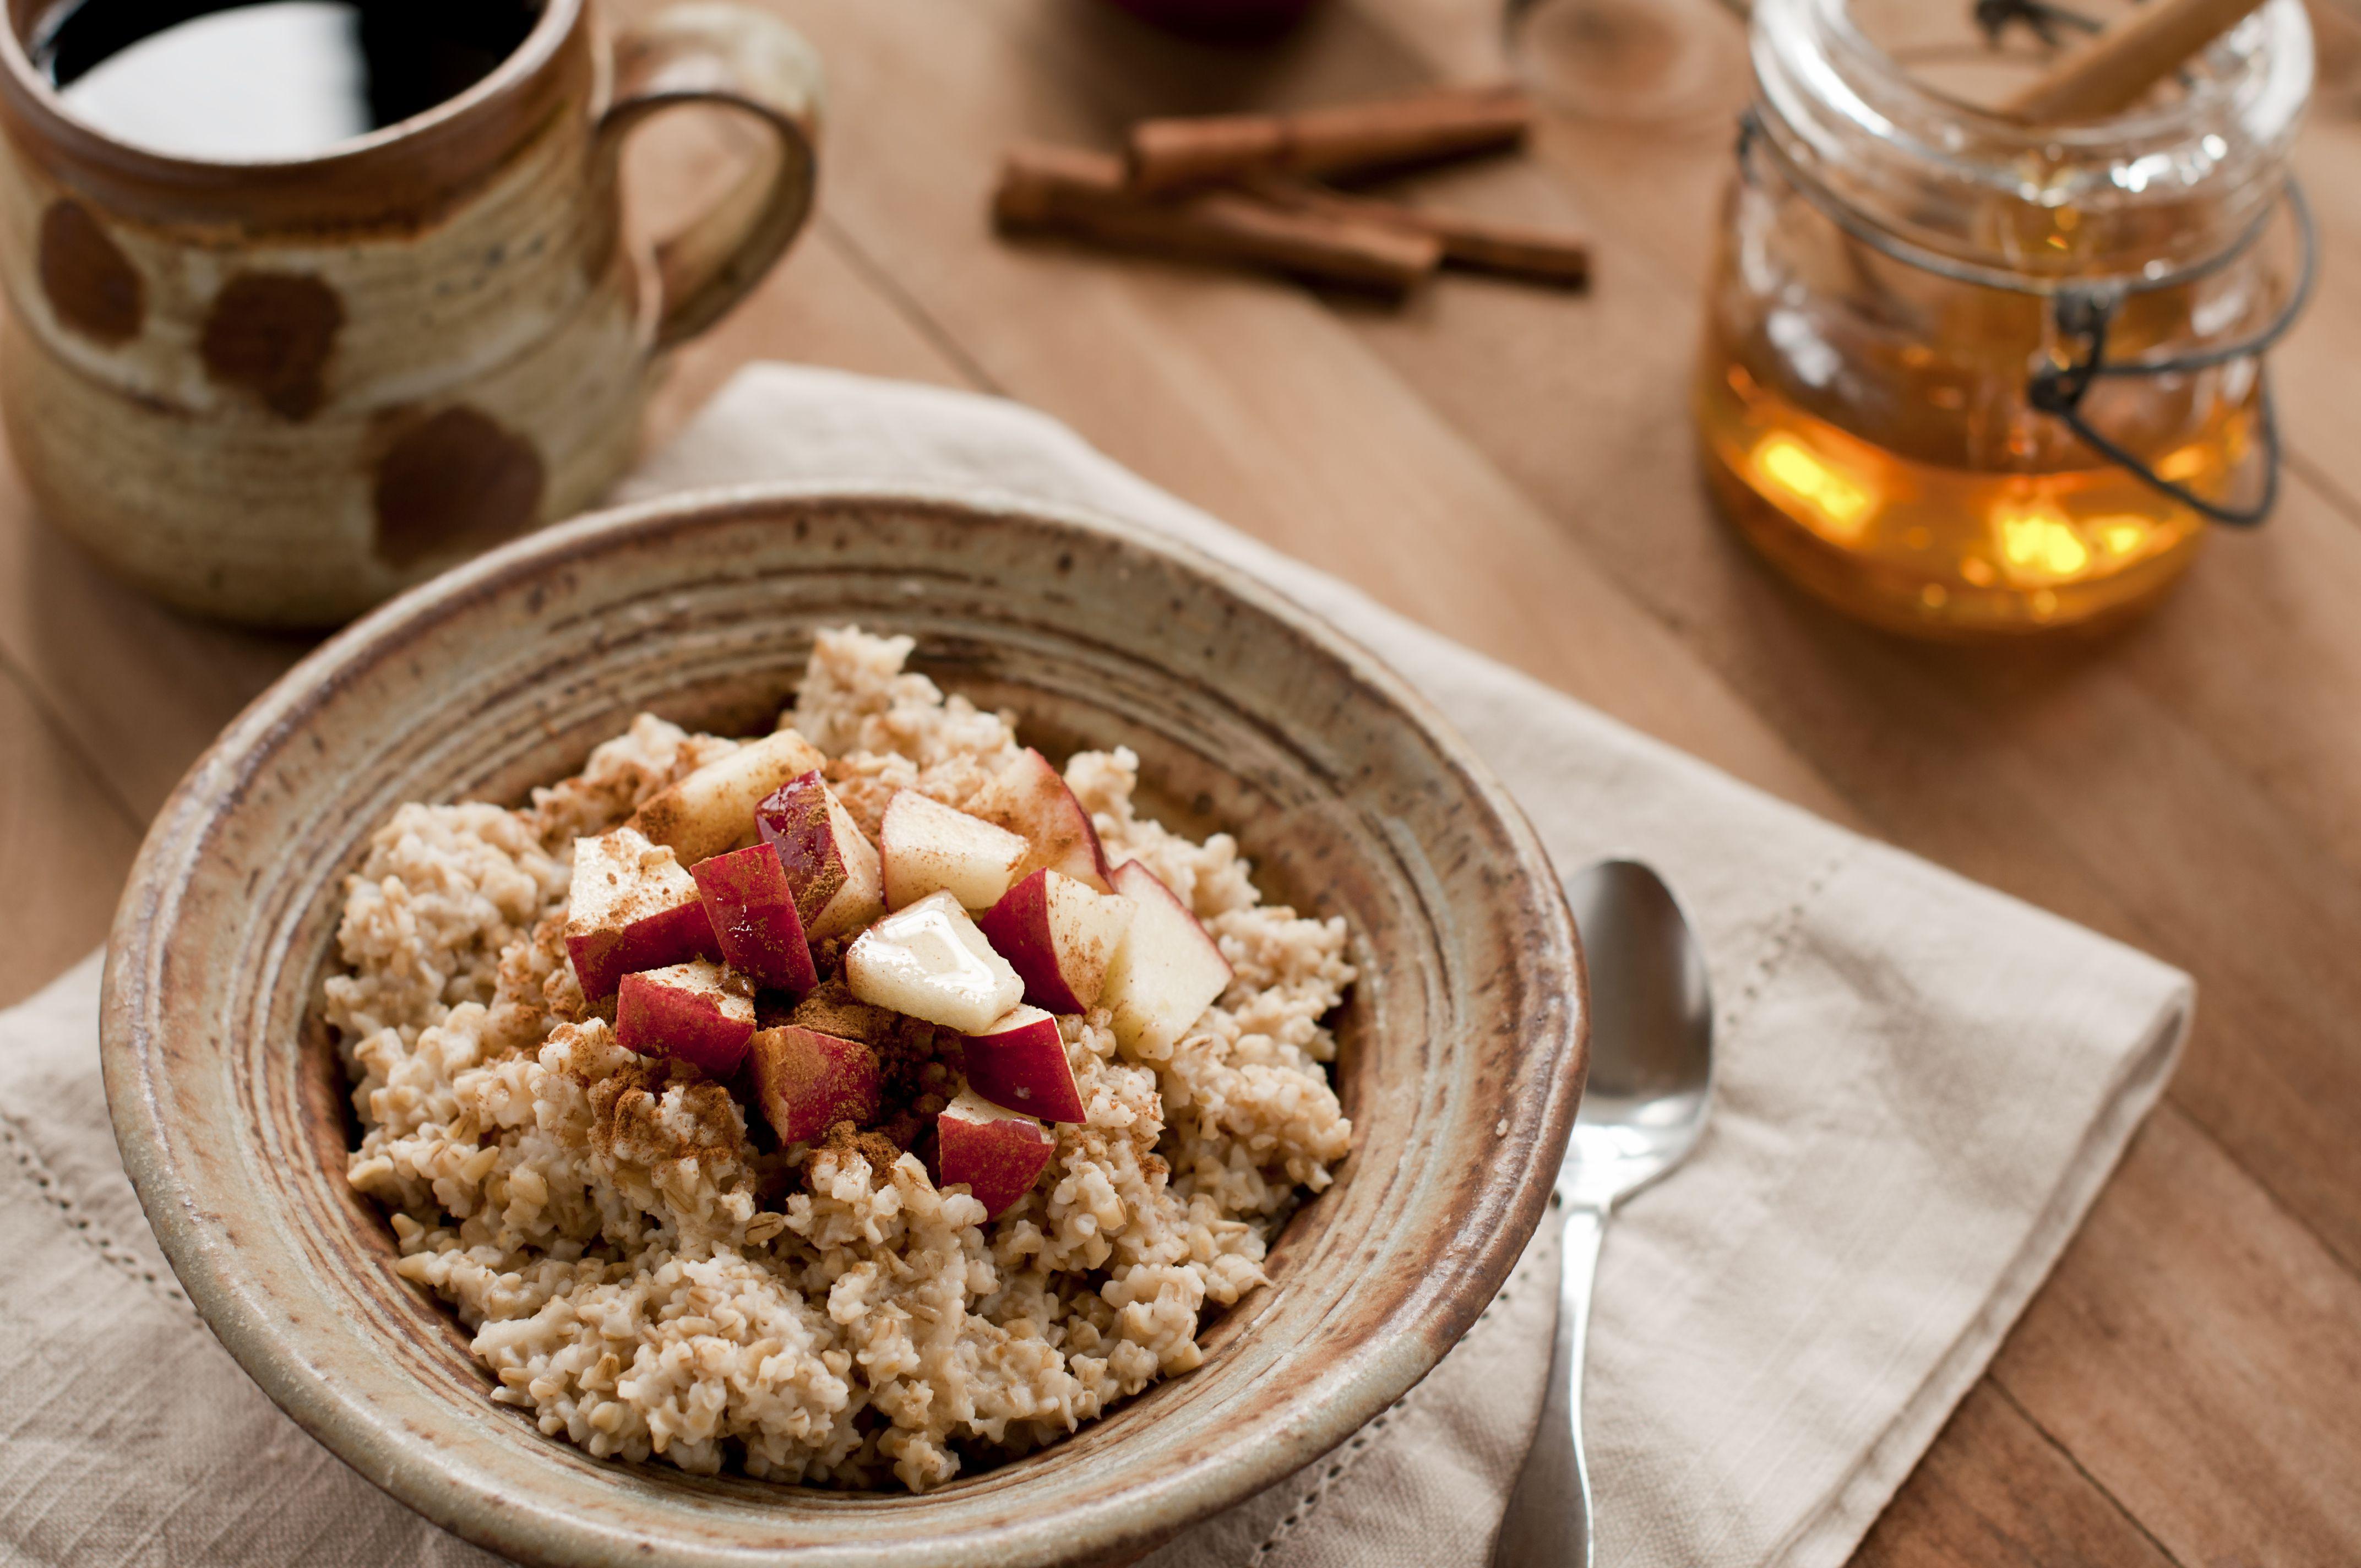 Блюда на завтрак в домашних условиях